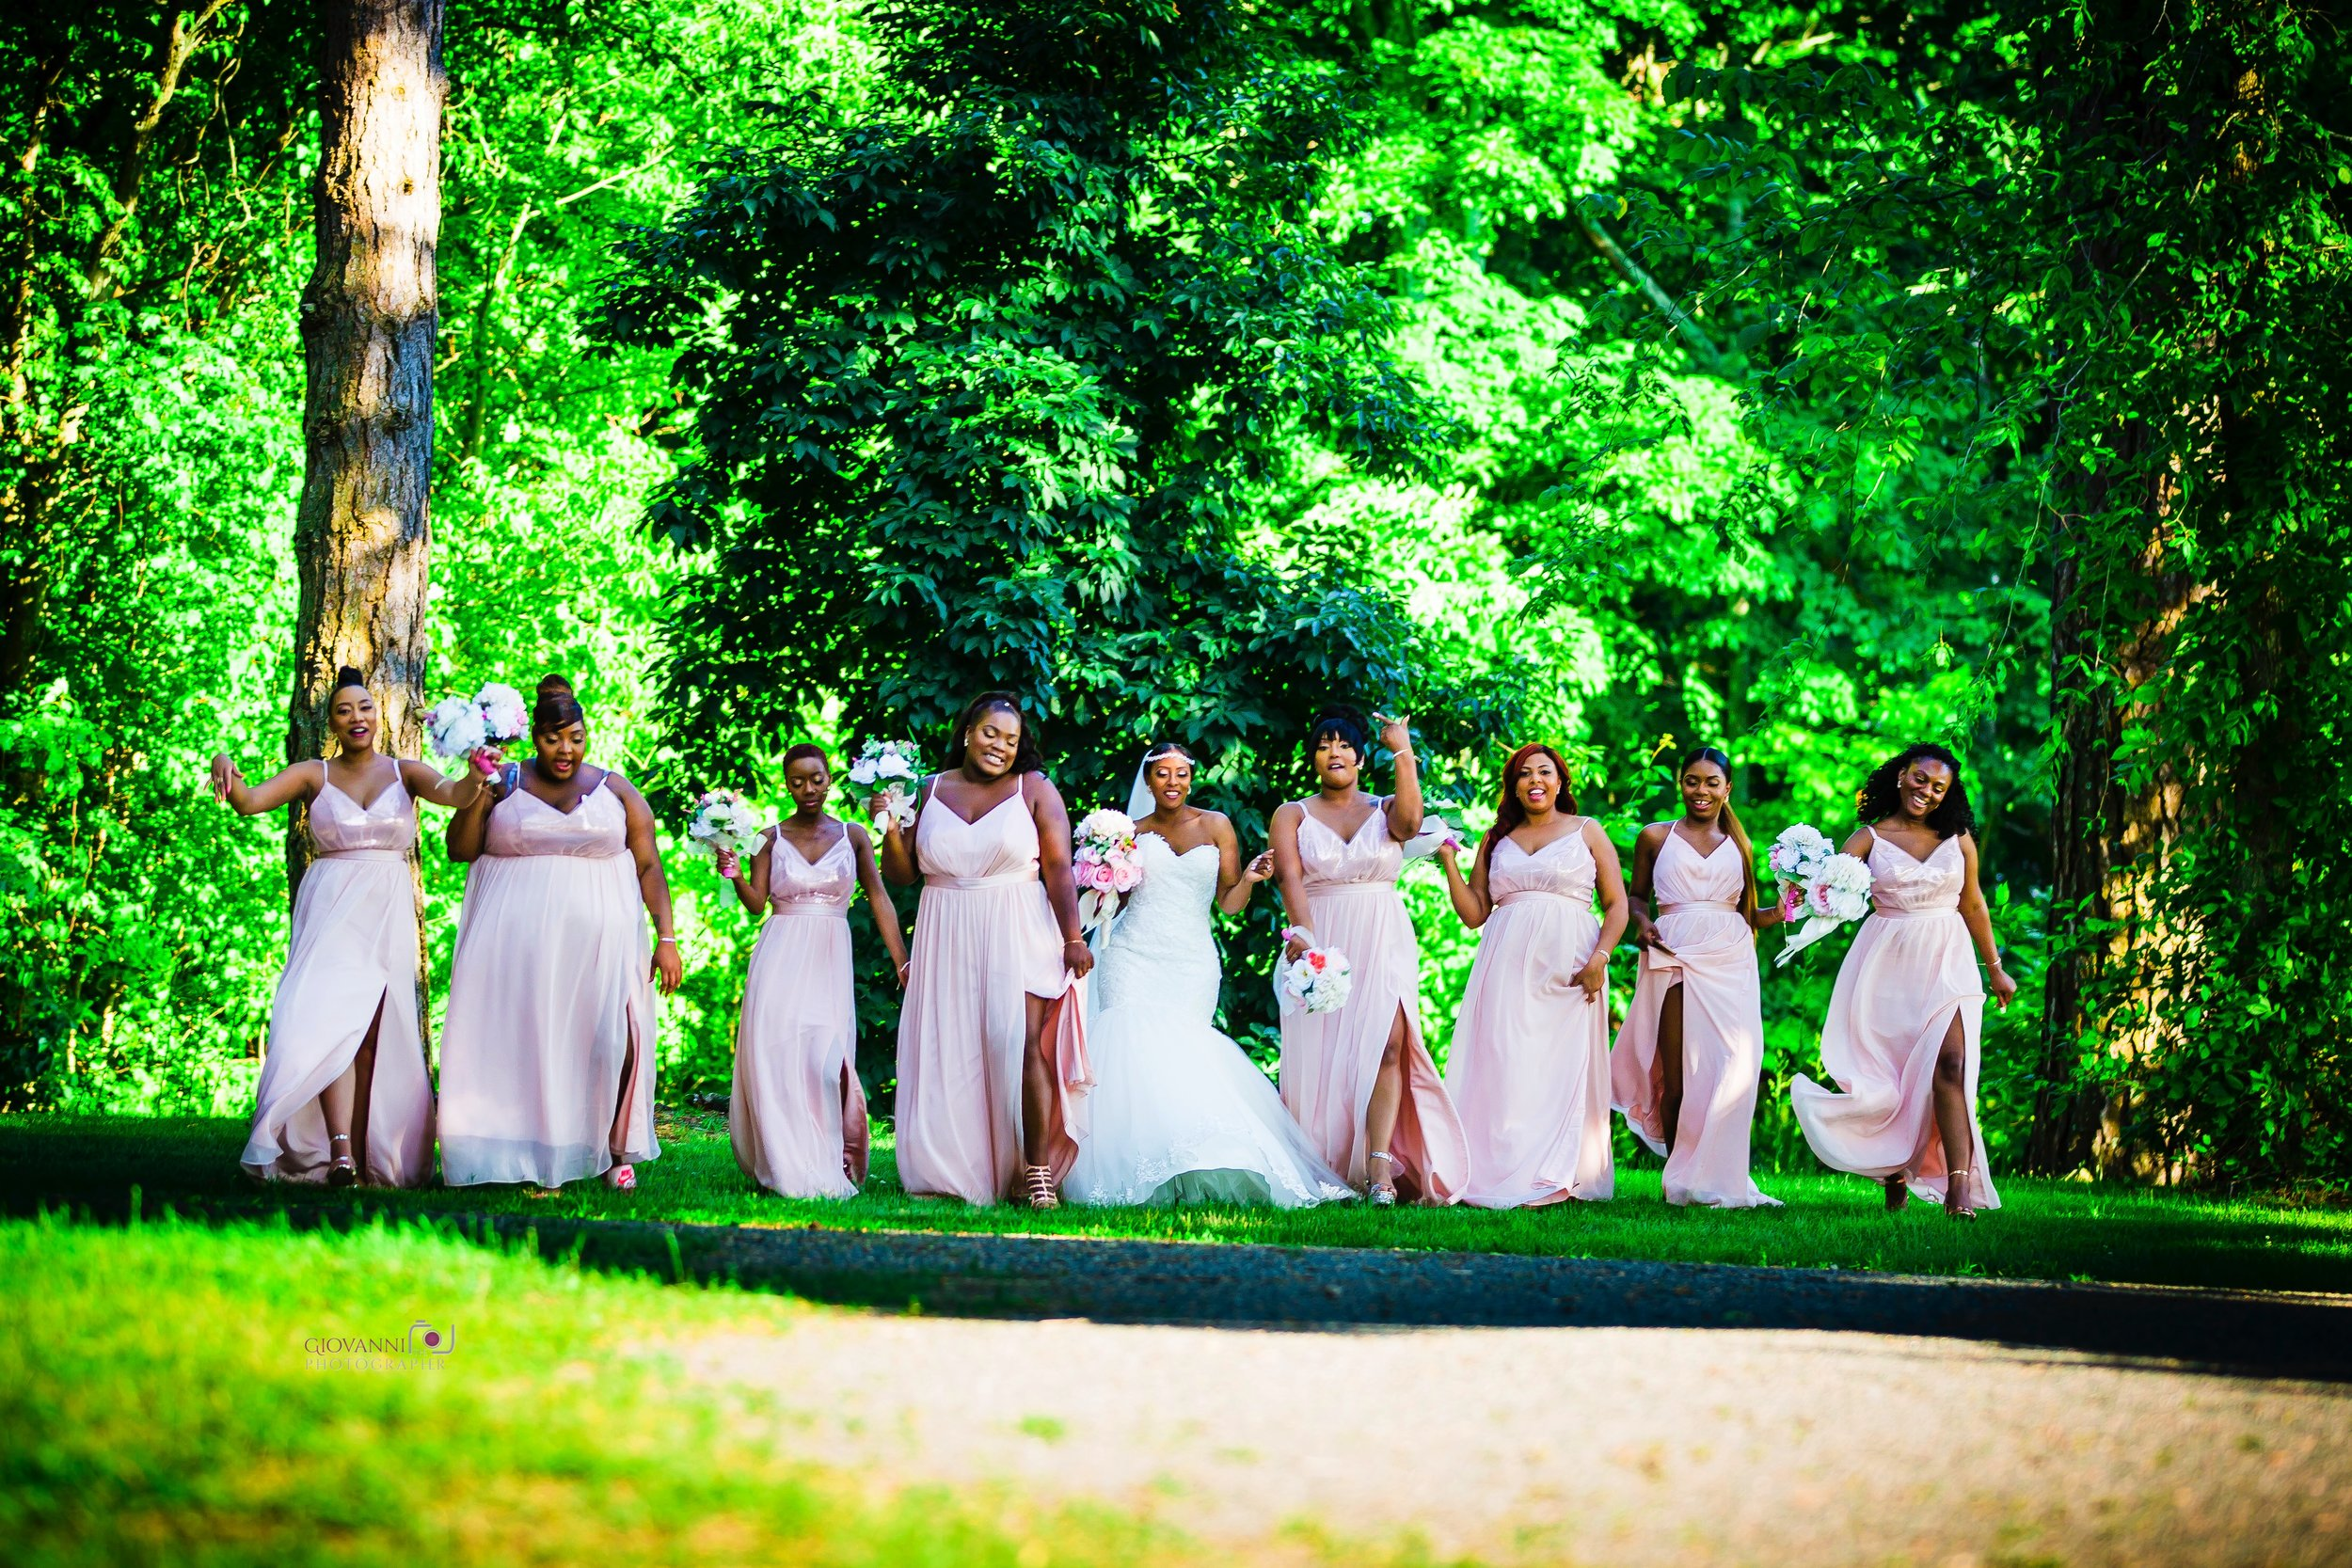 314A0738-Giovanni The Photographer-Best Boston Wedding Photography-Randolph Elks 2130 WM50.jpg